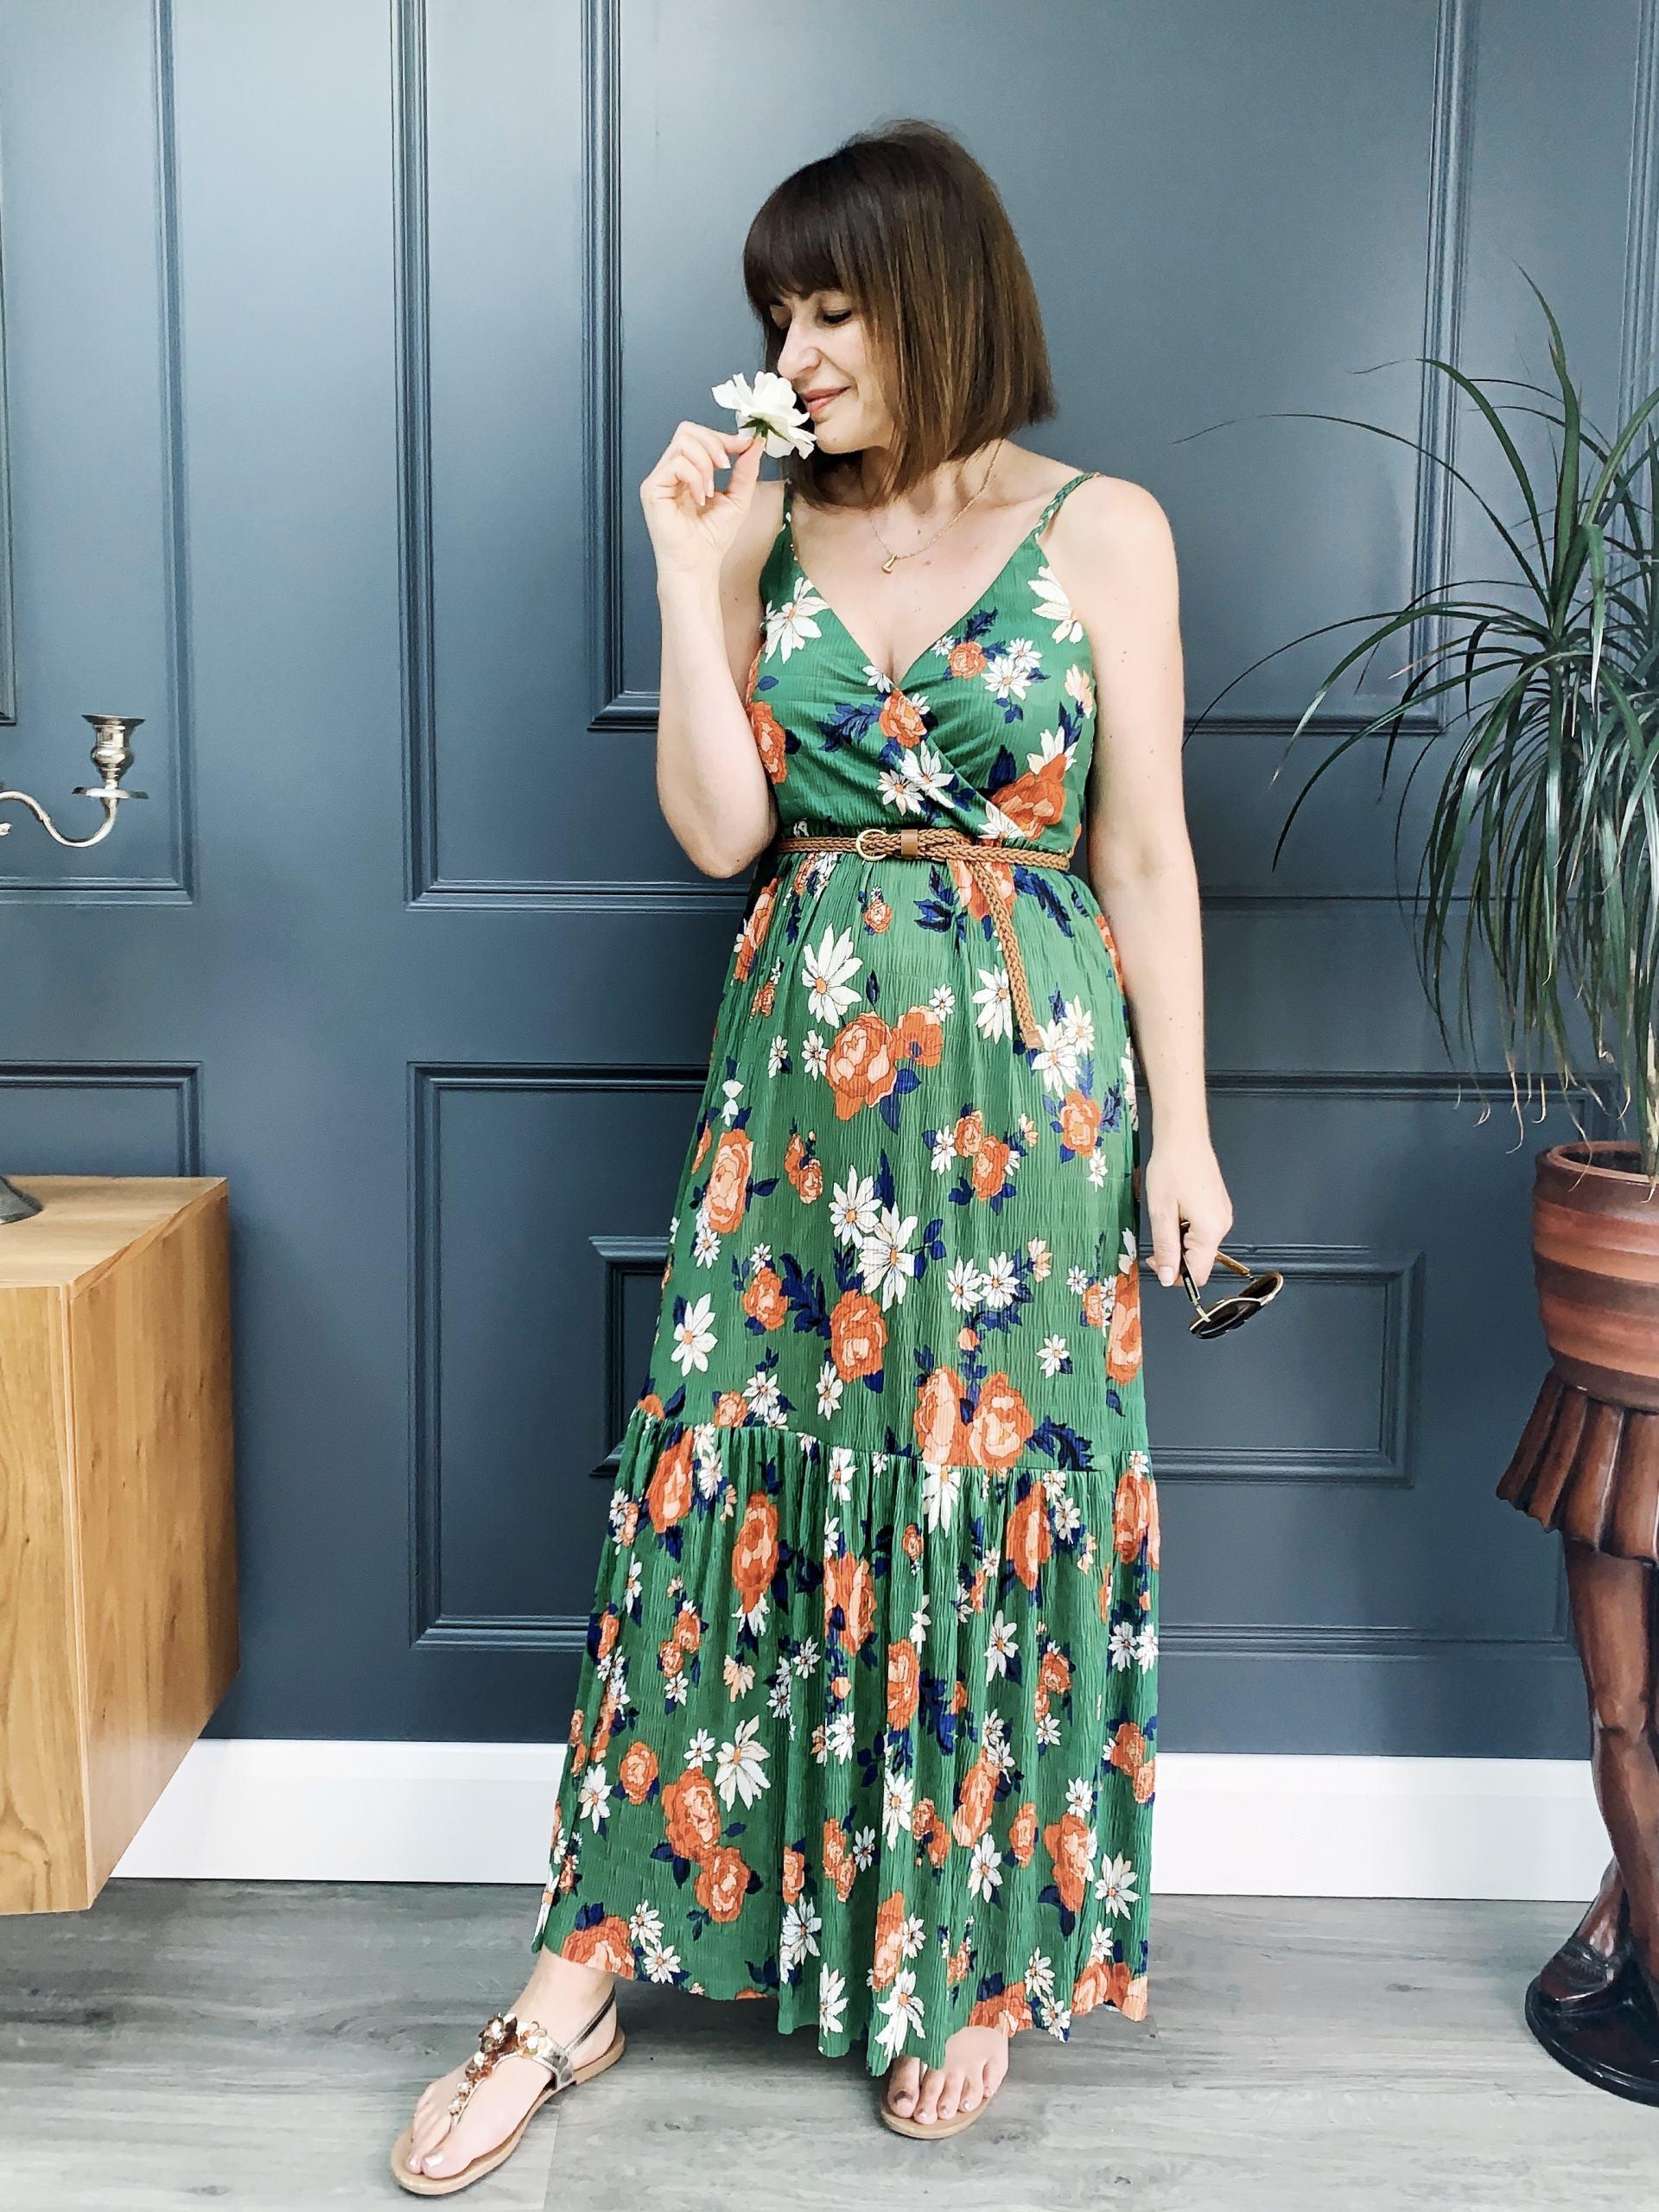 Lizzi in green Zara floral print dress